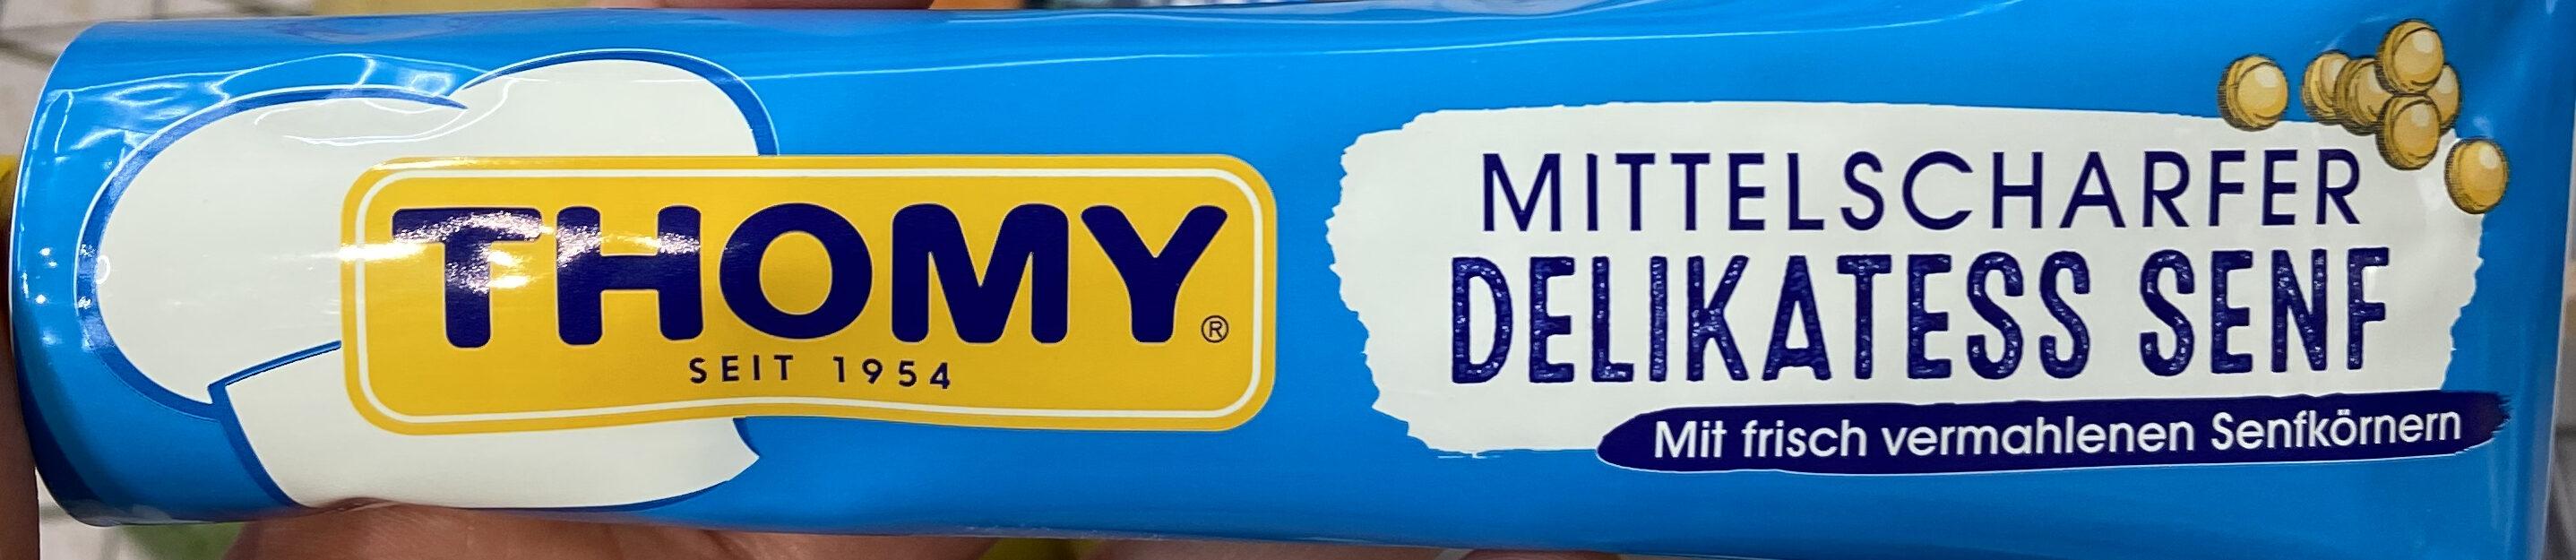 Mittelscharfer Delikatess Senf - Product - de